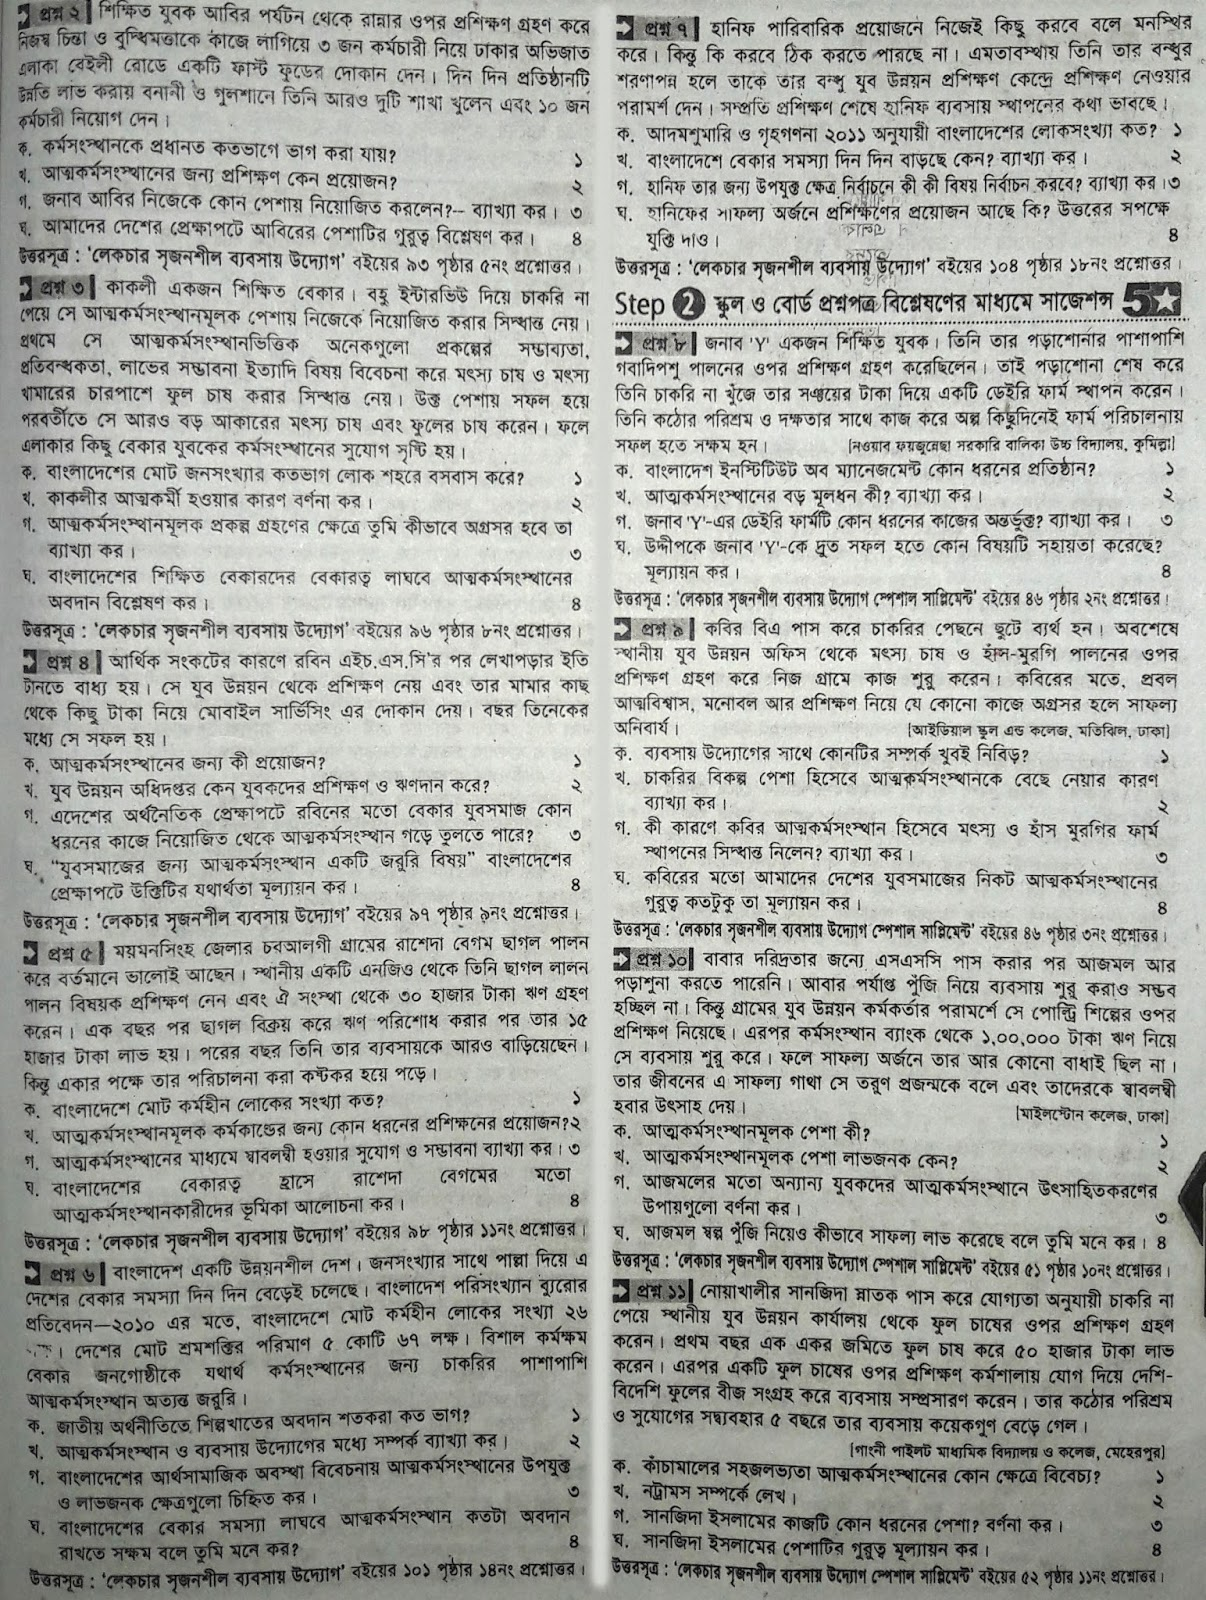 ssc Business Entrepreneurship suggestion, exam question paper, model question, mcq question, question pattern, preparation for dhaka board, all boards